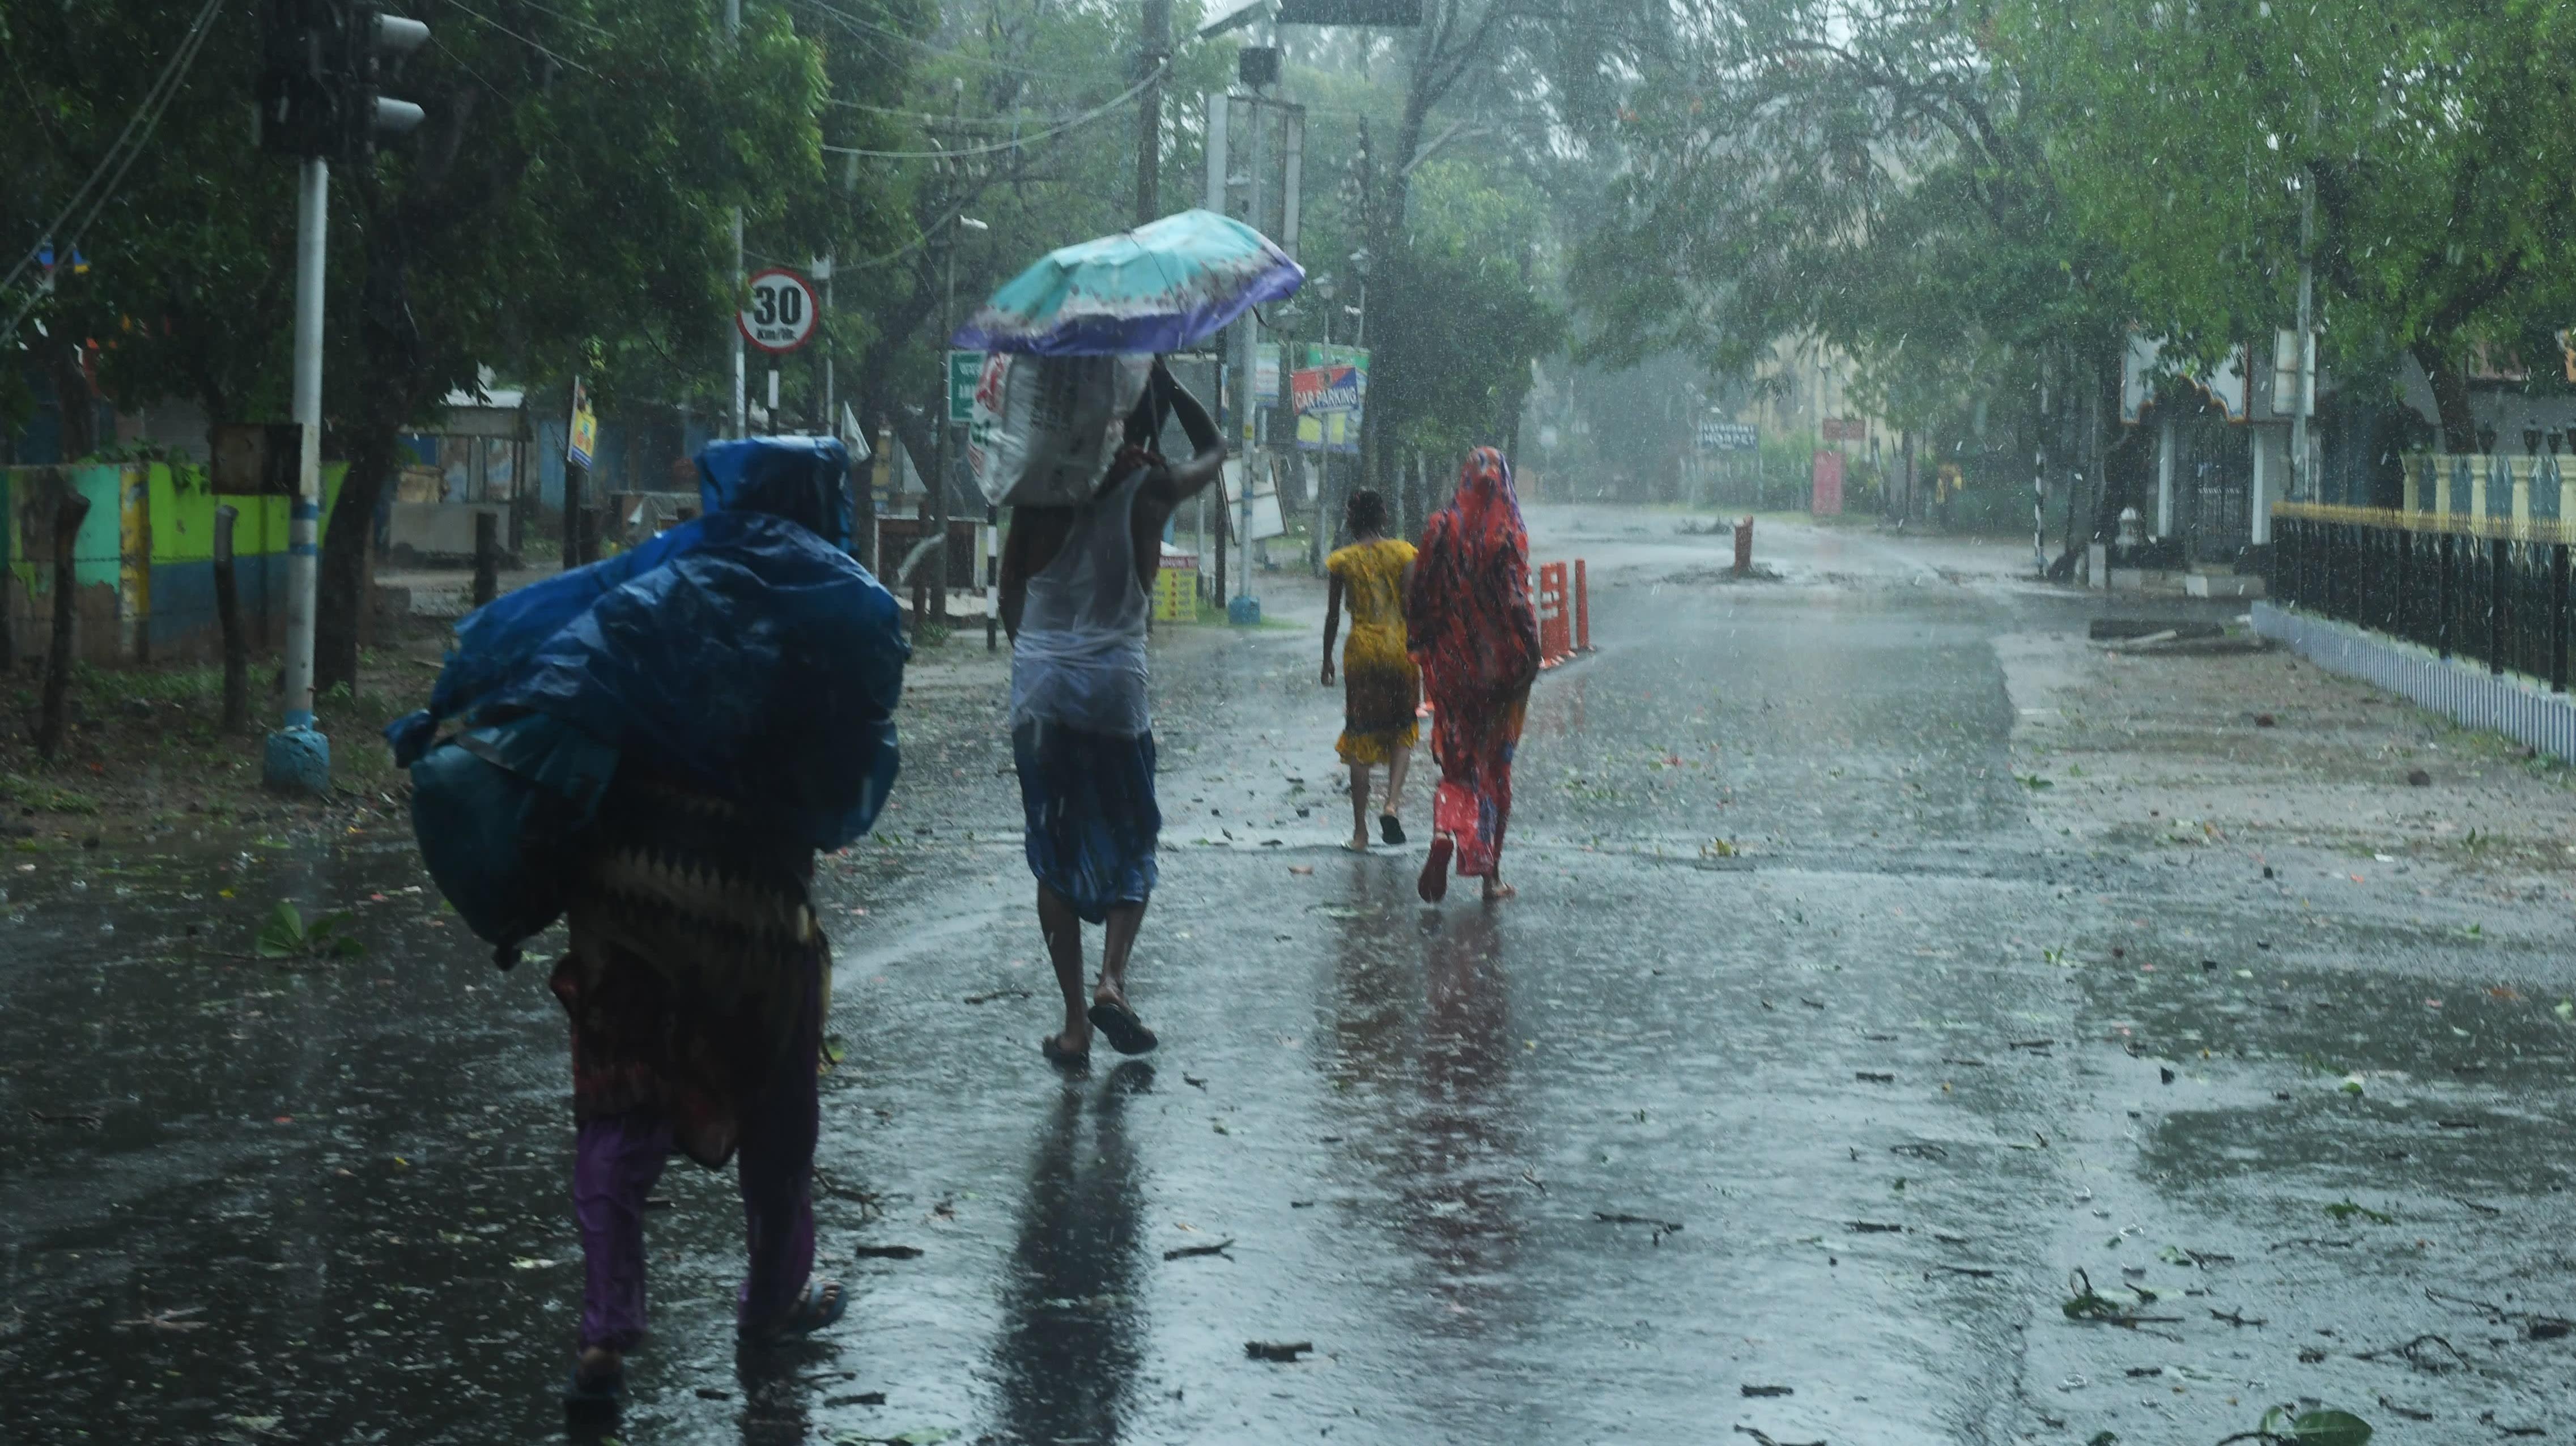 Cyclone Amphan Slams Into India's Coast Amid Coronavirus Pandemic